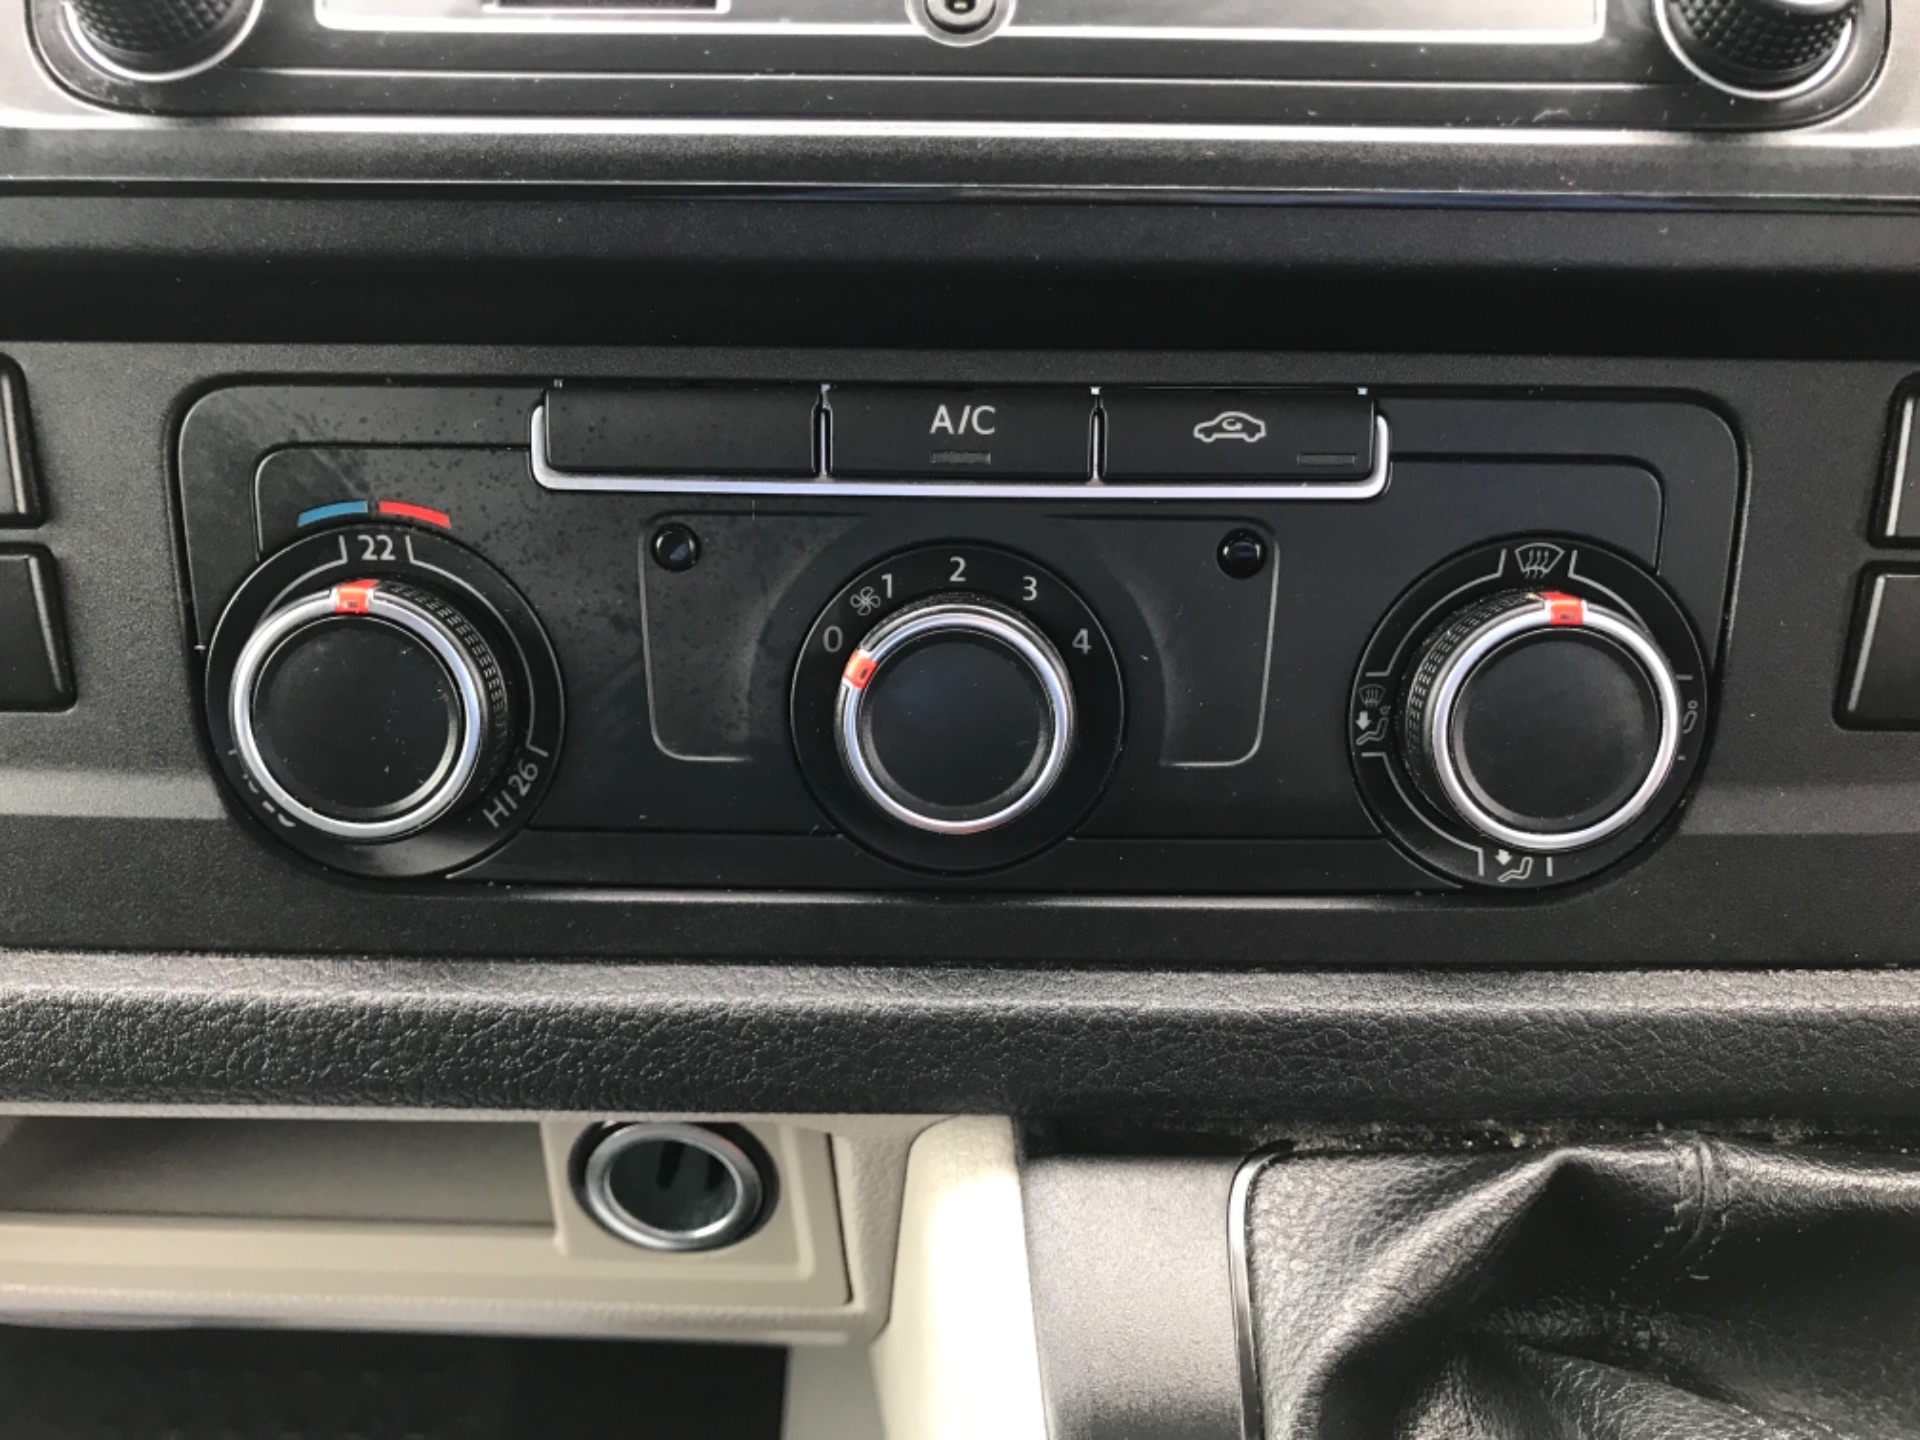 2019 Volkswagen Transporter 2.0 Tdi Bmt 150 Highline Van EURO 6 (GX69ZSN) Image 22